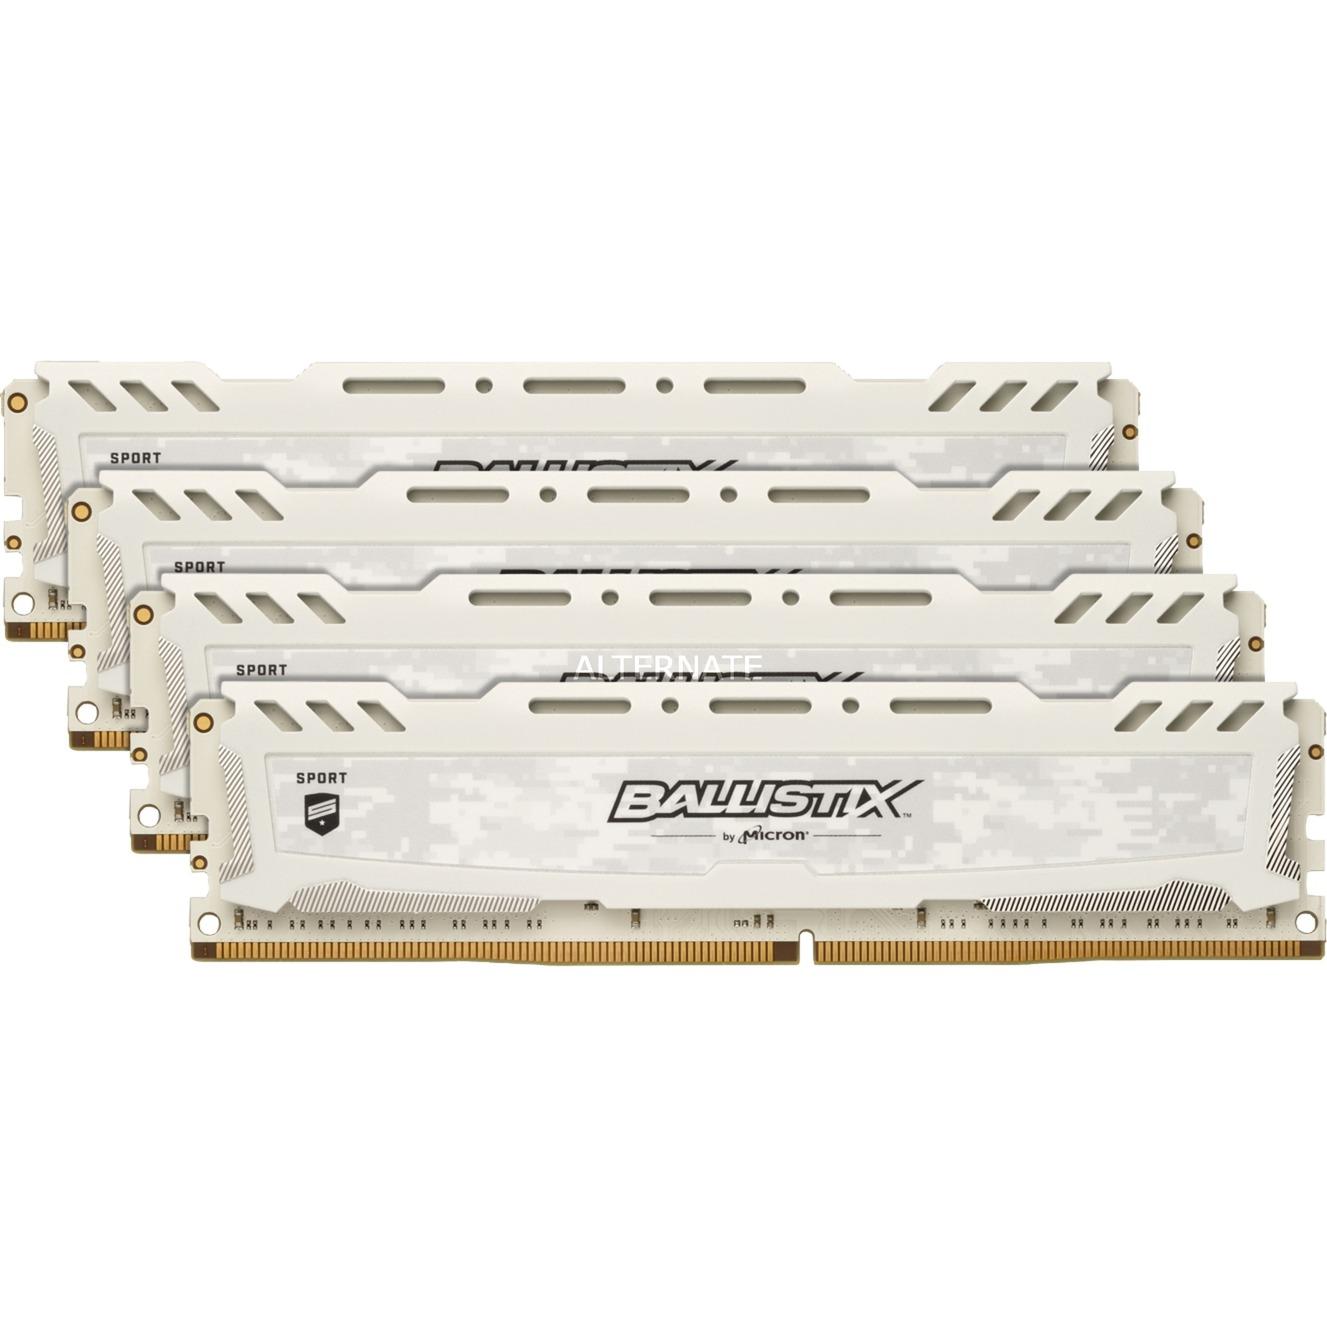 Ballistix Sport LT módulo de memoria 32 GB DDR4 2400 MHz, Memoria RAM